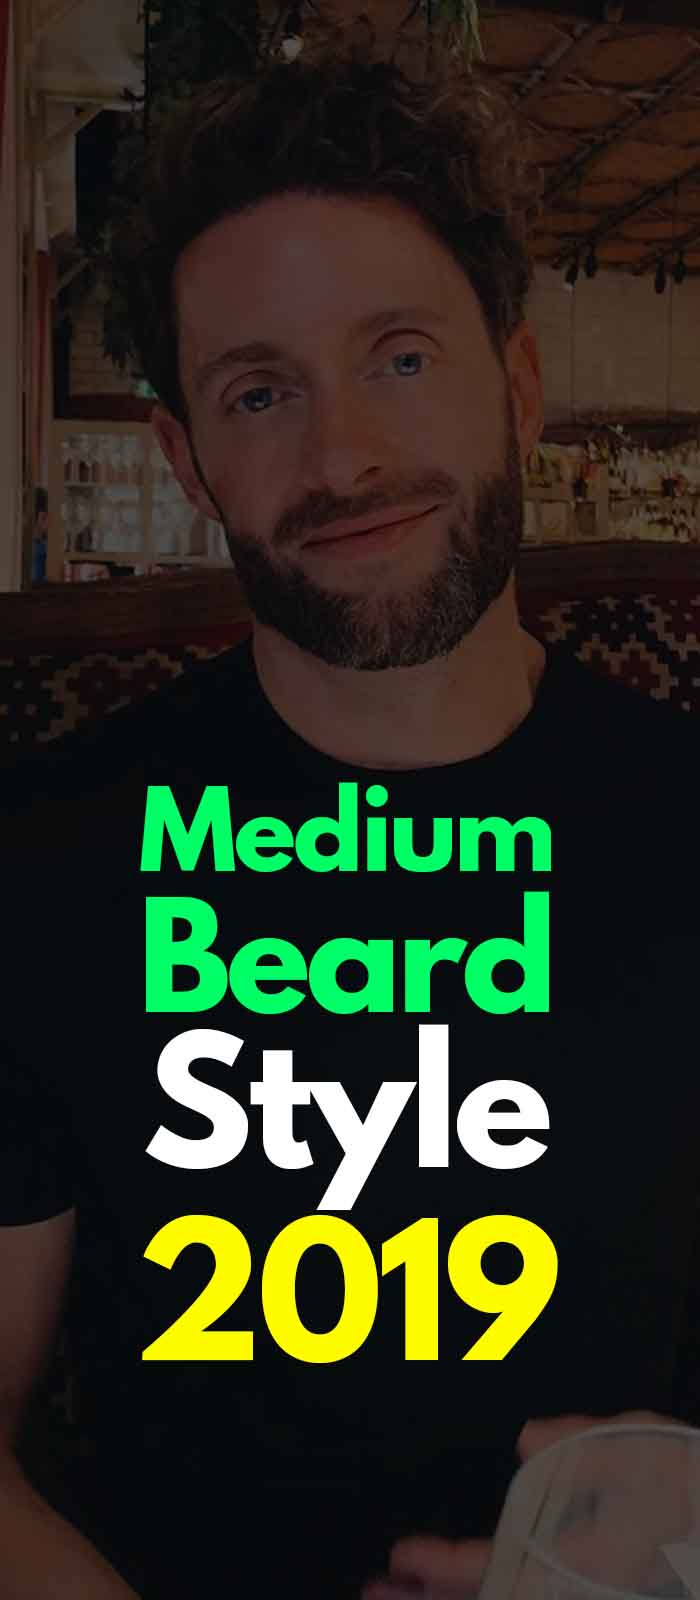 Black Tshirt, Medium Beard style for men!